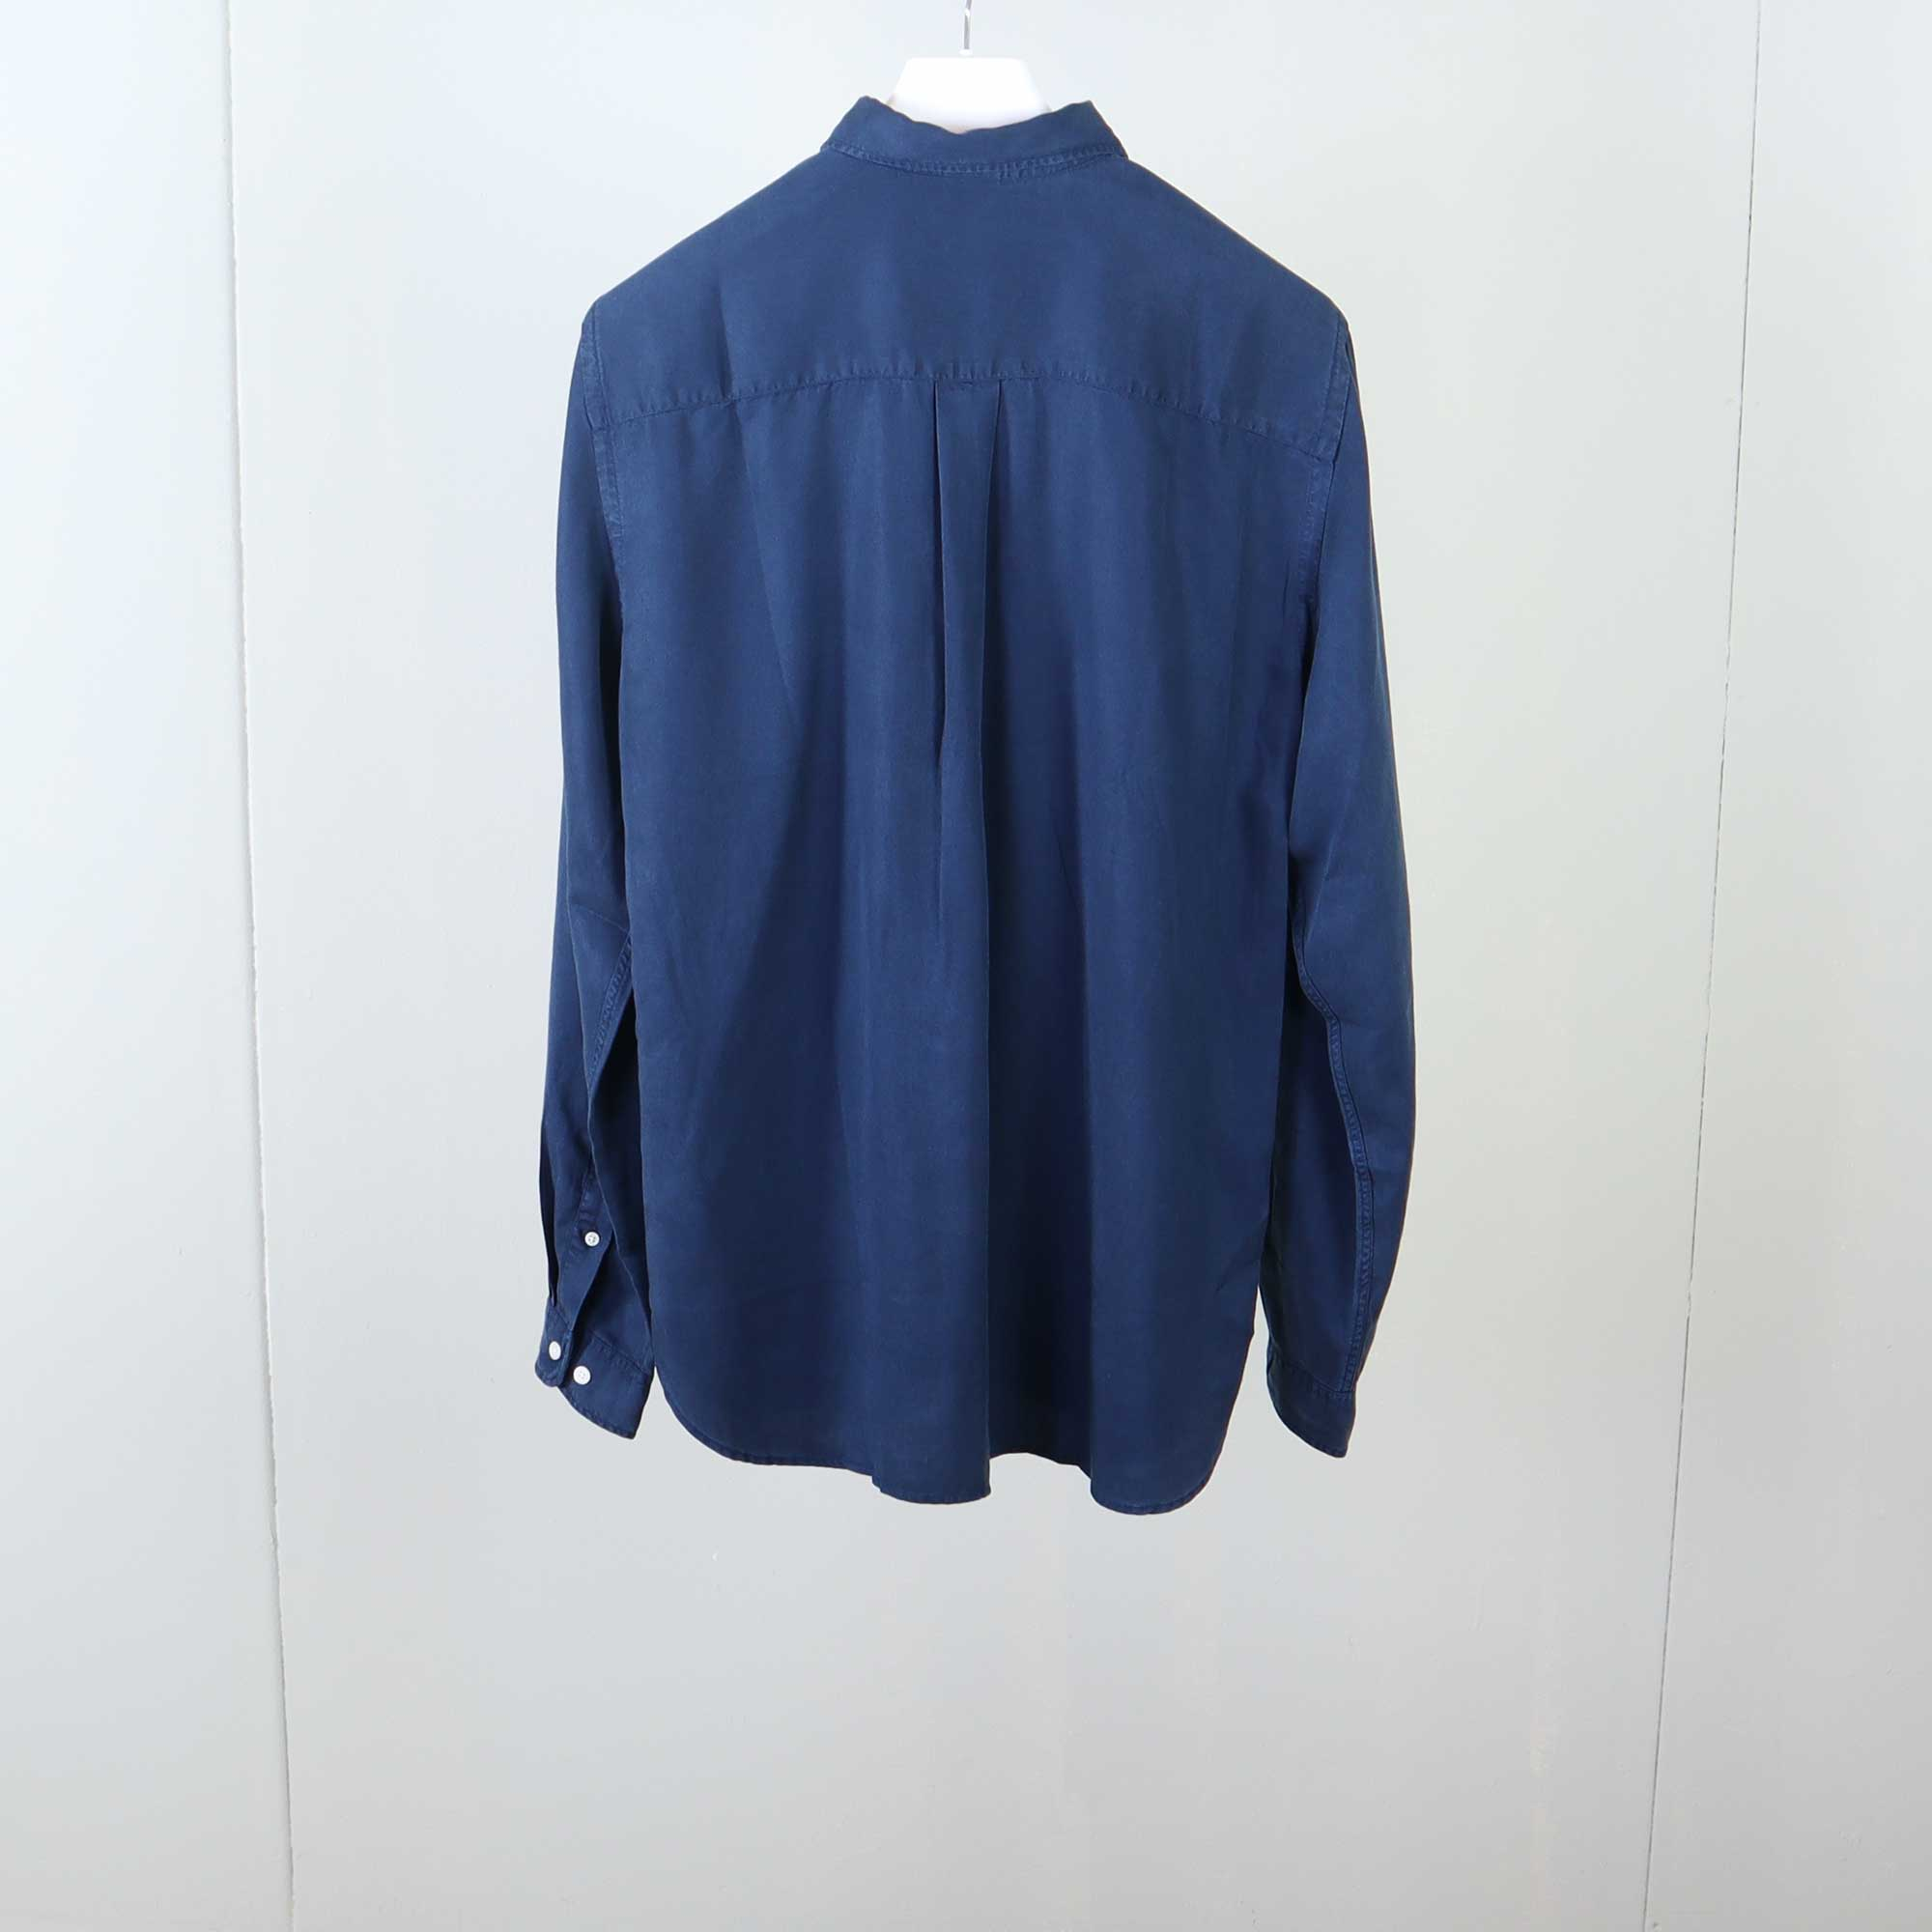 blouse-darkblue-6